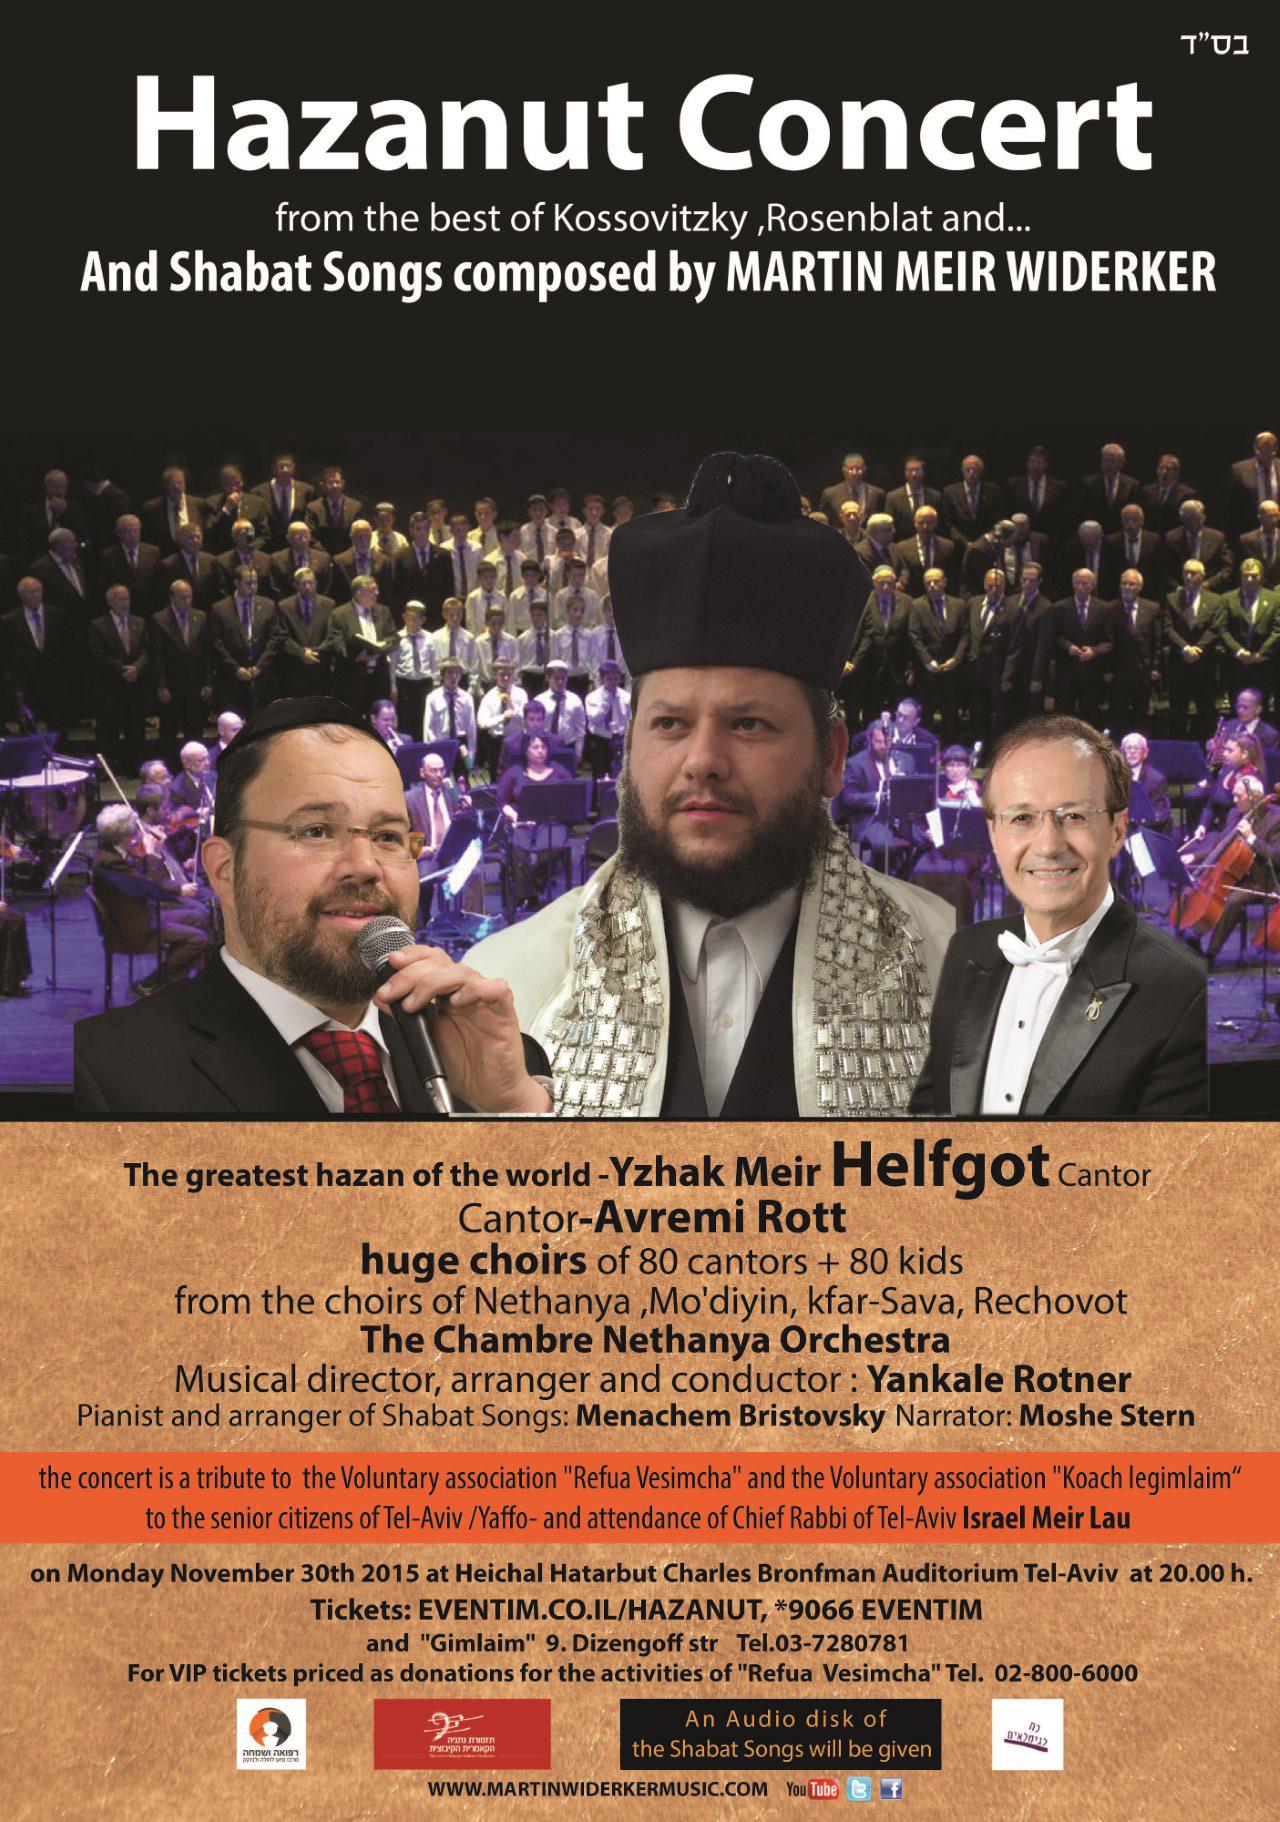 Hazzanut Concert